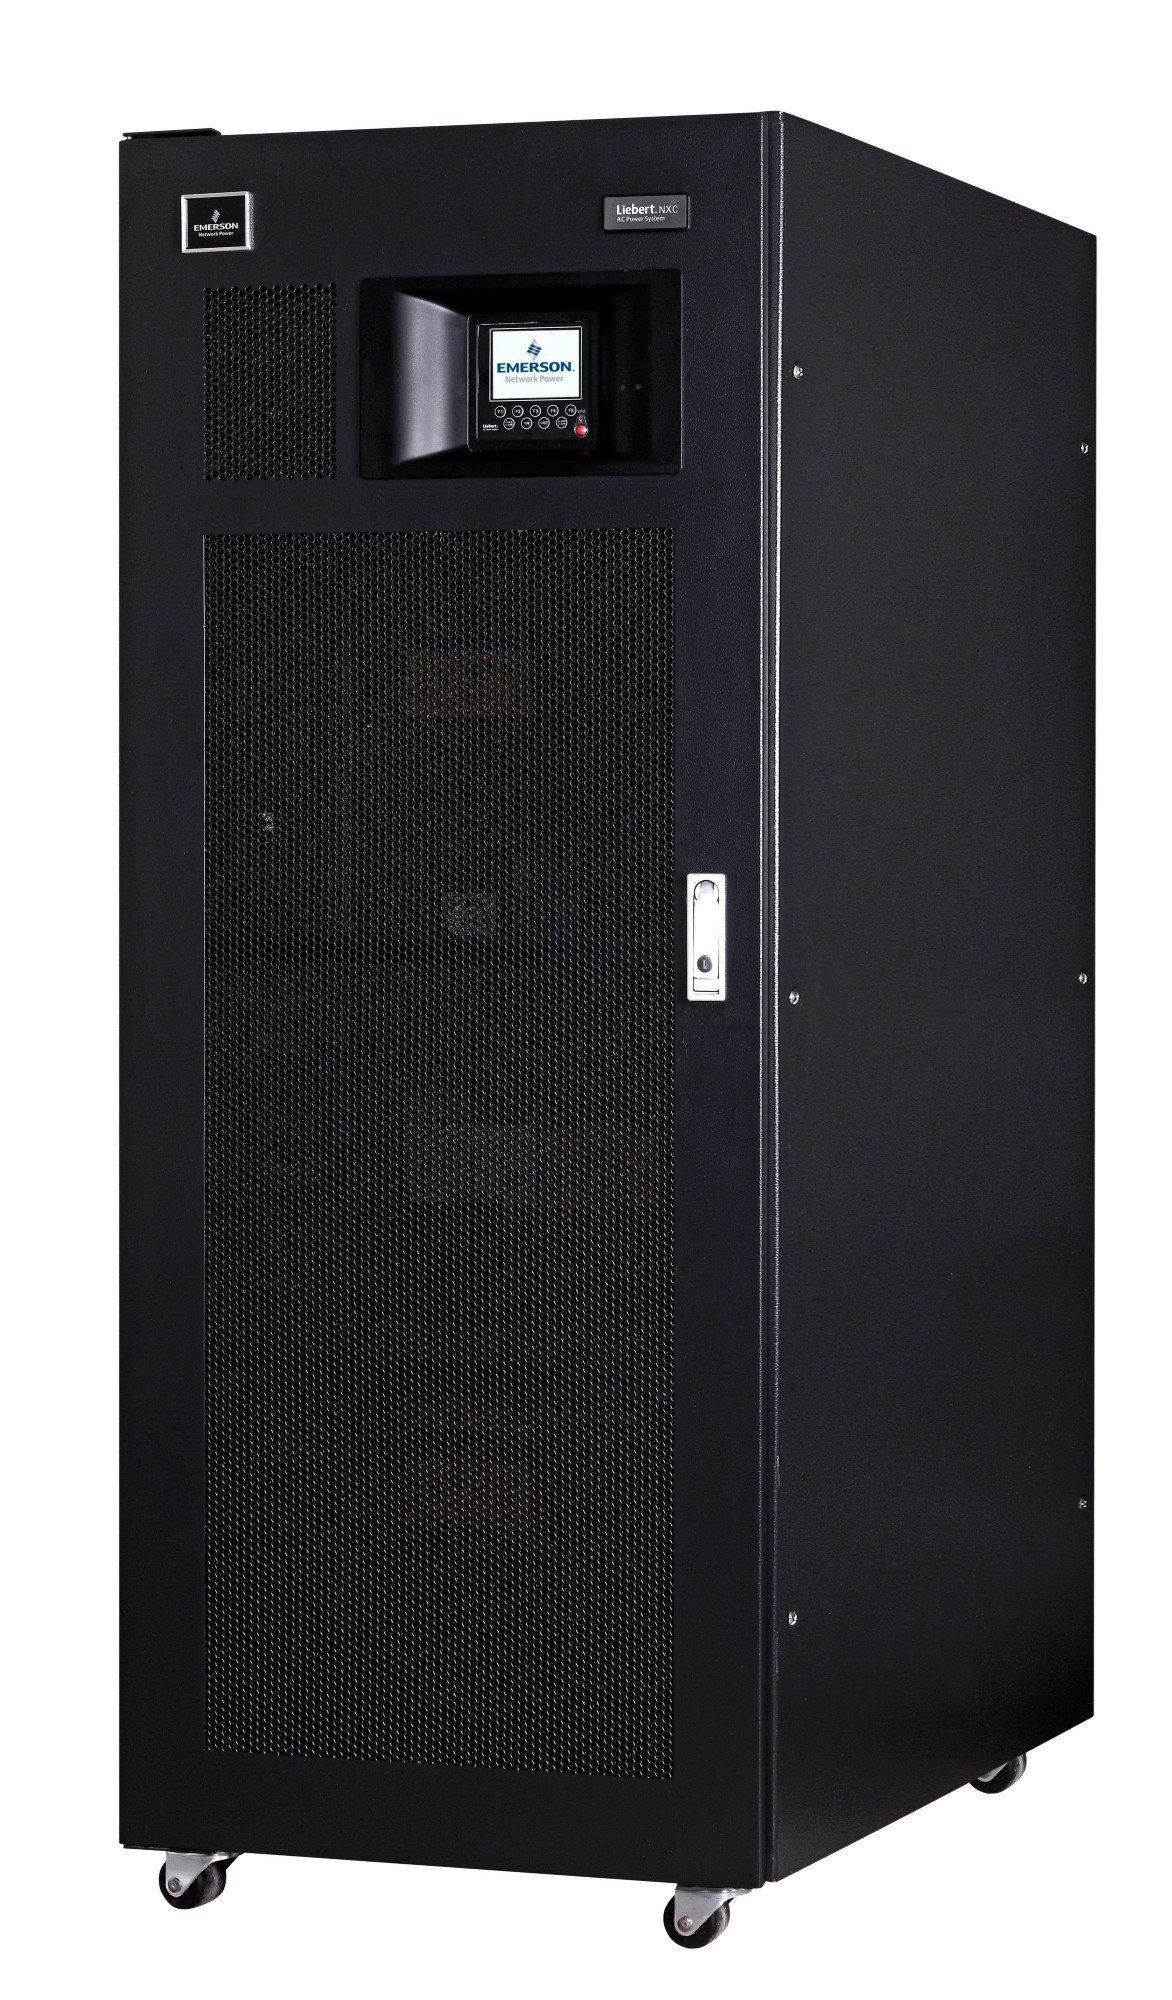 An image of Vertiv liebert nxc 30kva uninterruptible power supply (ups) 30000 va double-conv...